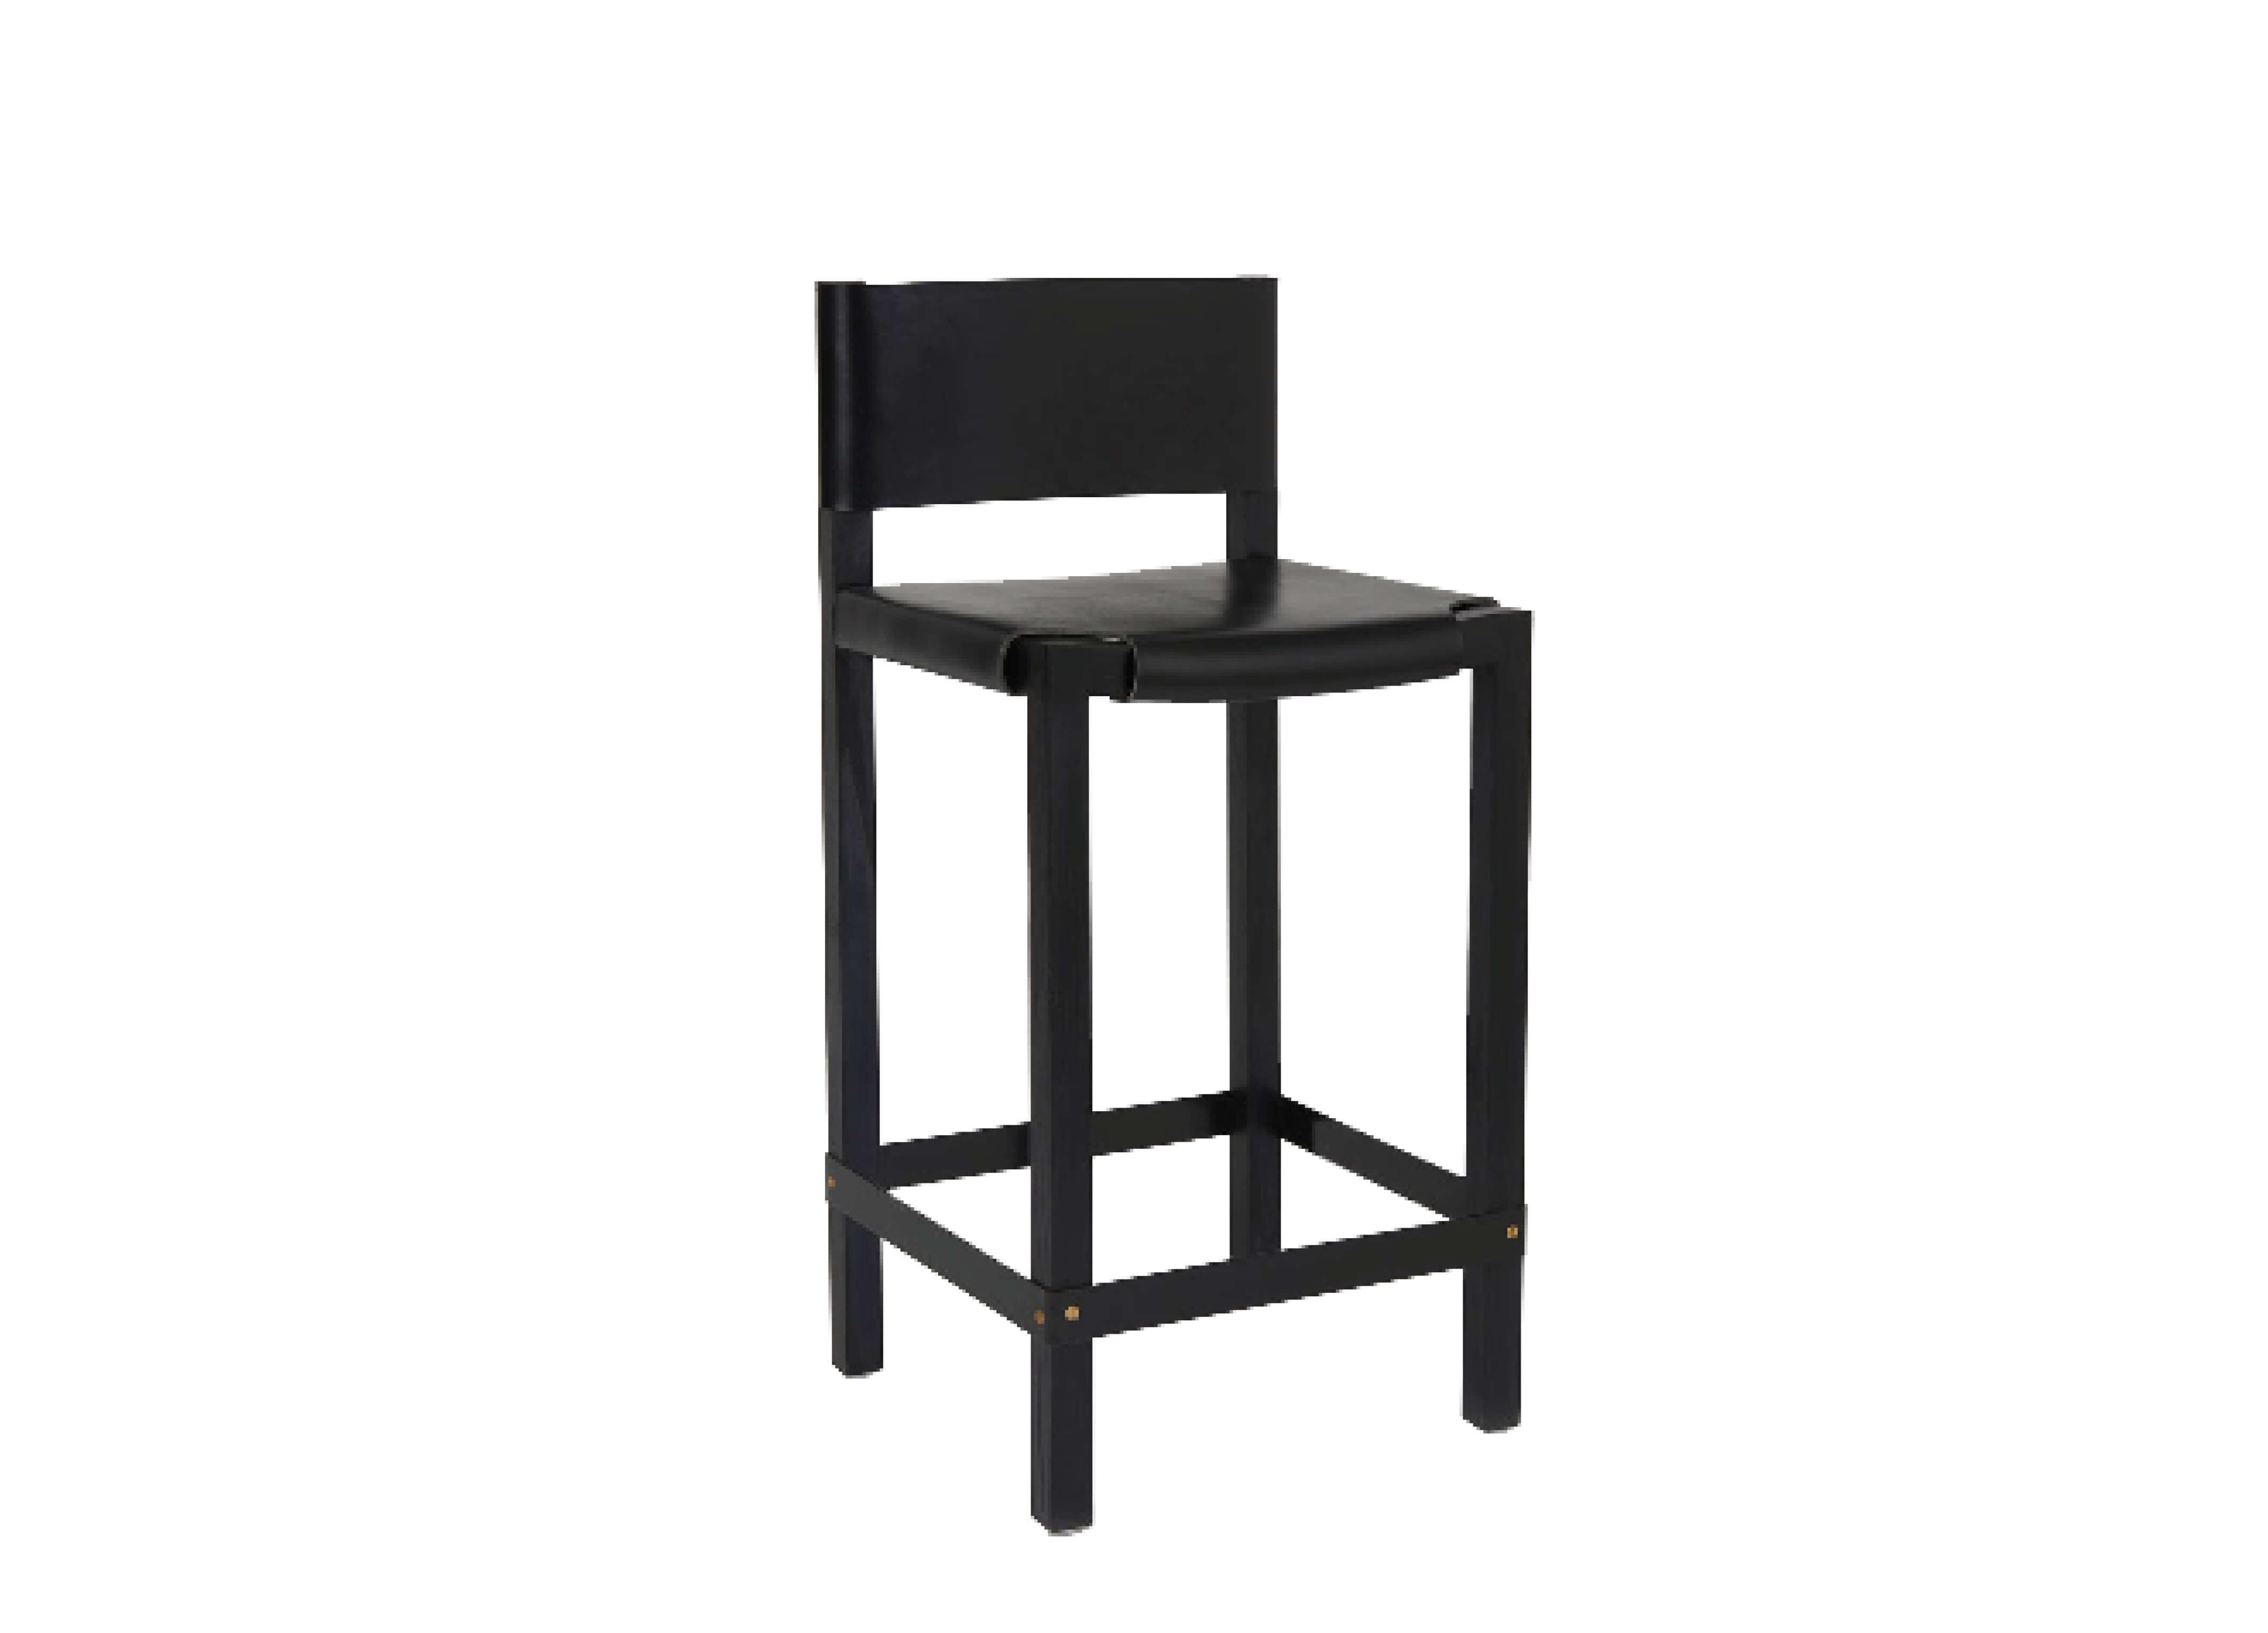 Pleasing Rd Bar Stool By Douglasbec Est Living Design Directory Machost Co Dining Chair Design Ideas Machostcouk